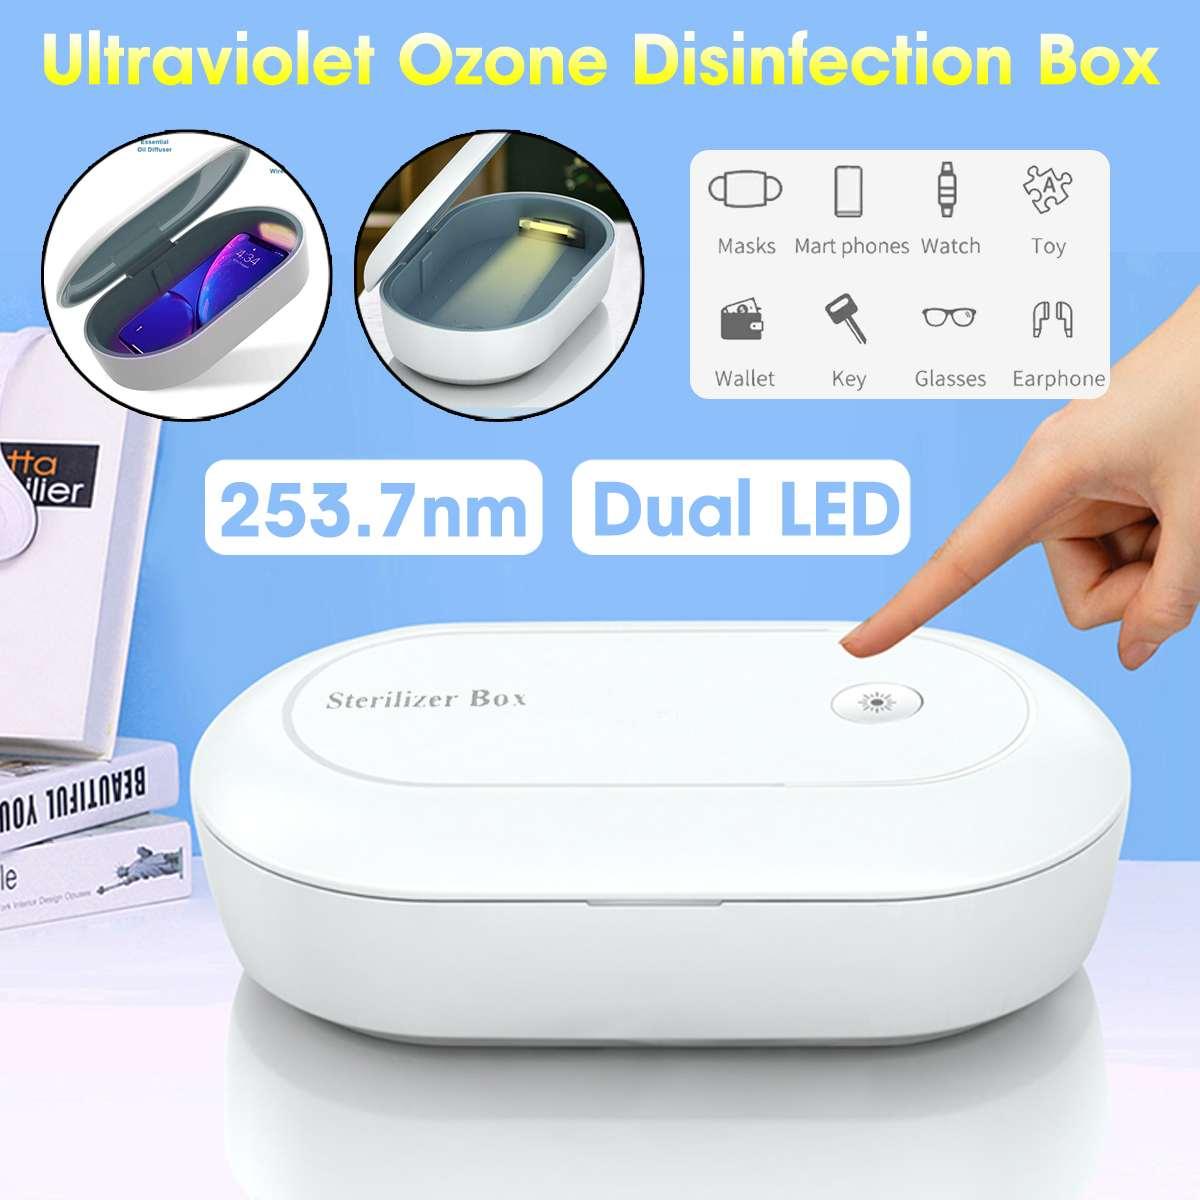 Portable UV Sterilizer Box Phone Mask Cleaner Personal Sanitizer Disinfection Cabinet UV Sterilizer Lamp Wireless Charging